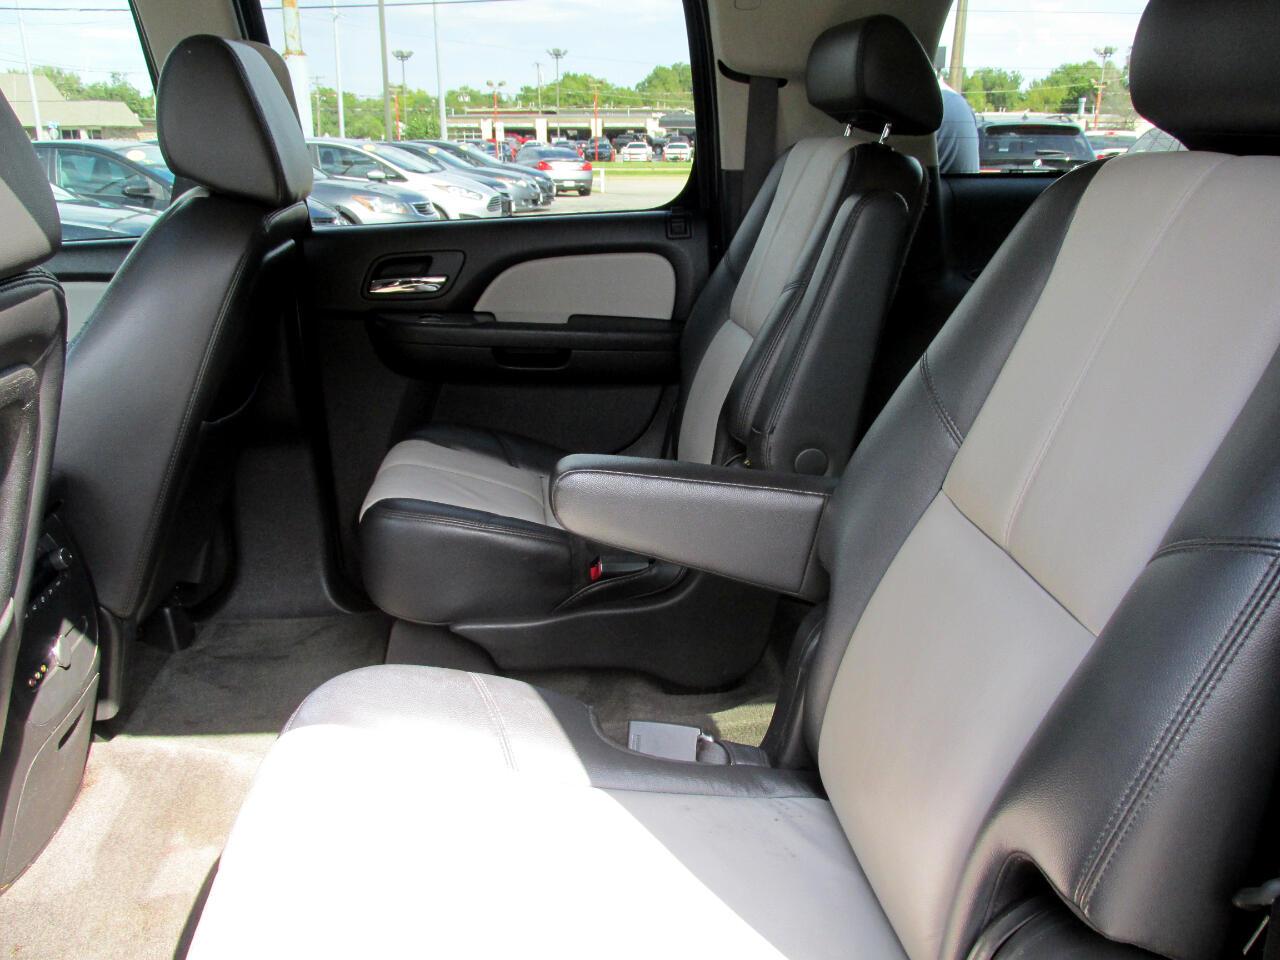 Chevrolet Suburban LTZ 1500 4WD 2008